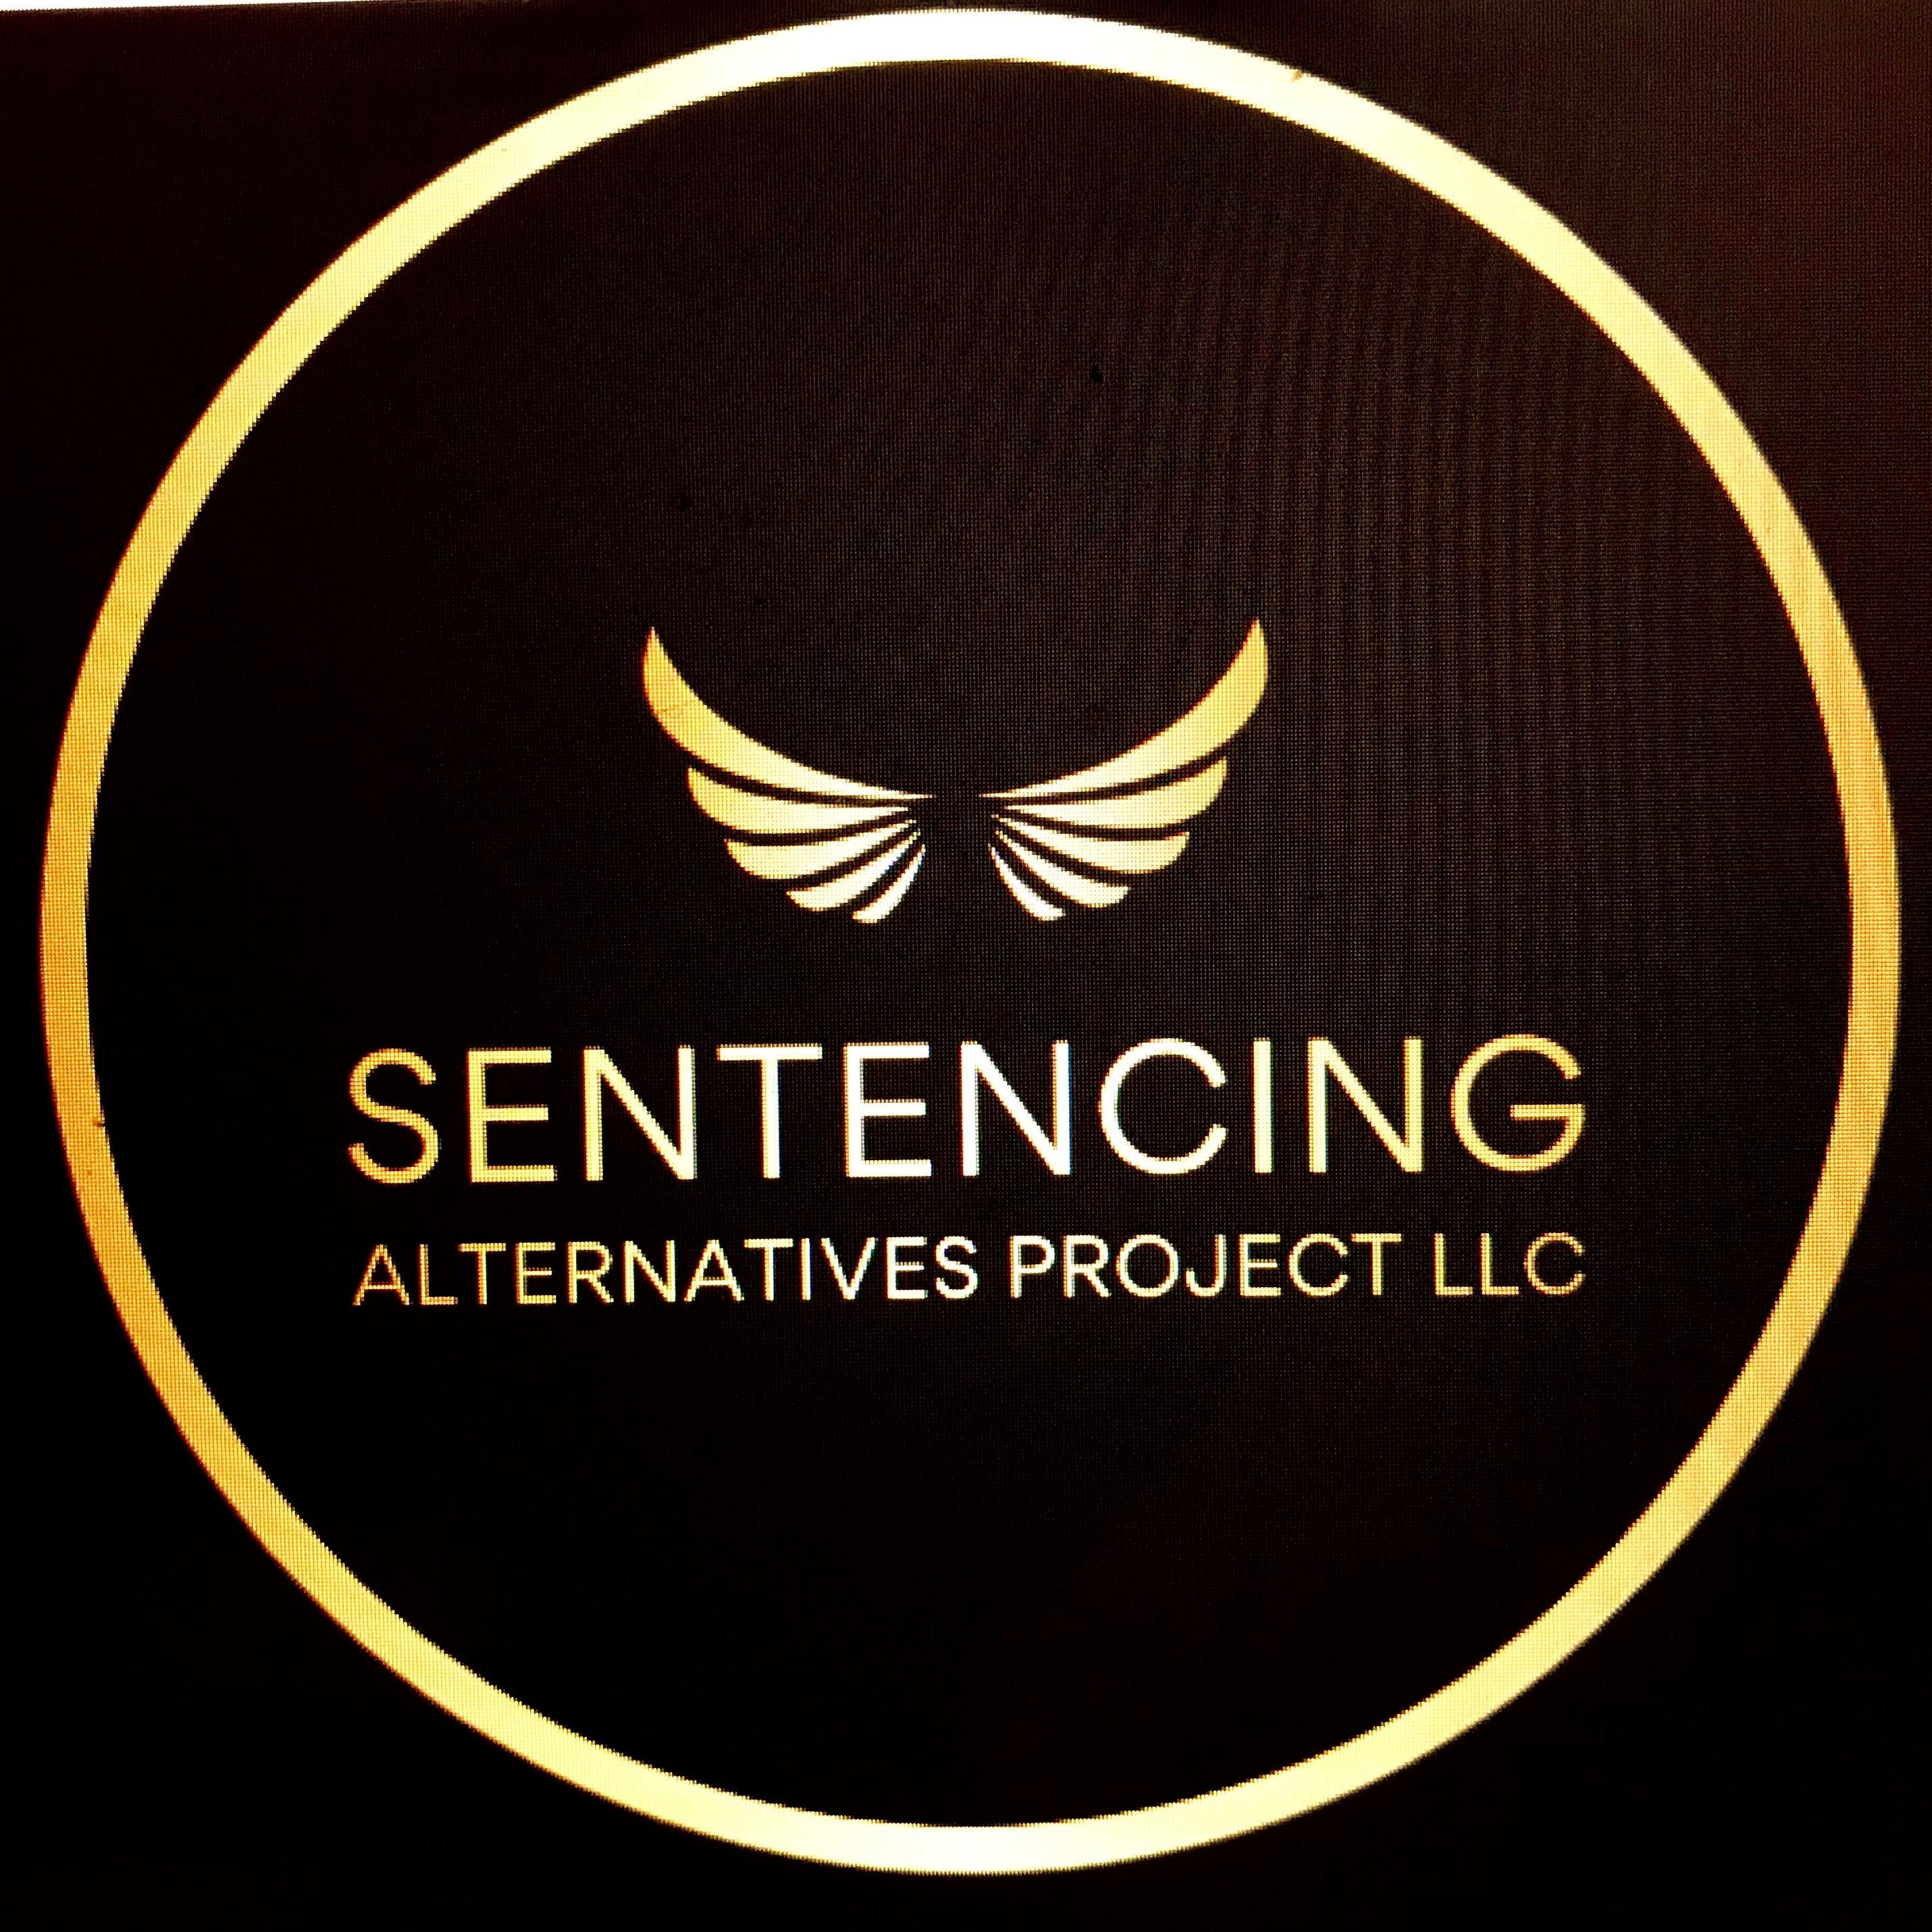 Sentencing Alternatives Project LLC